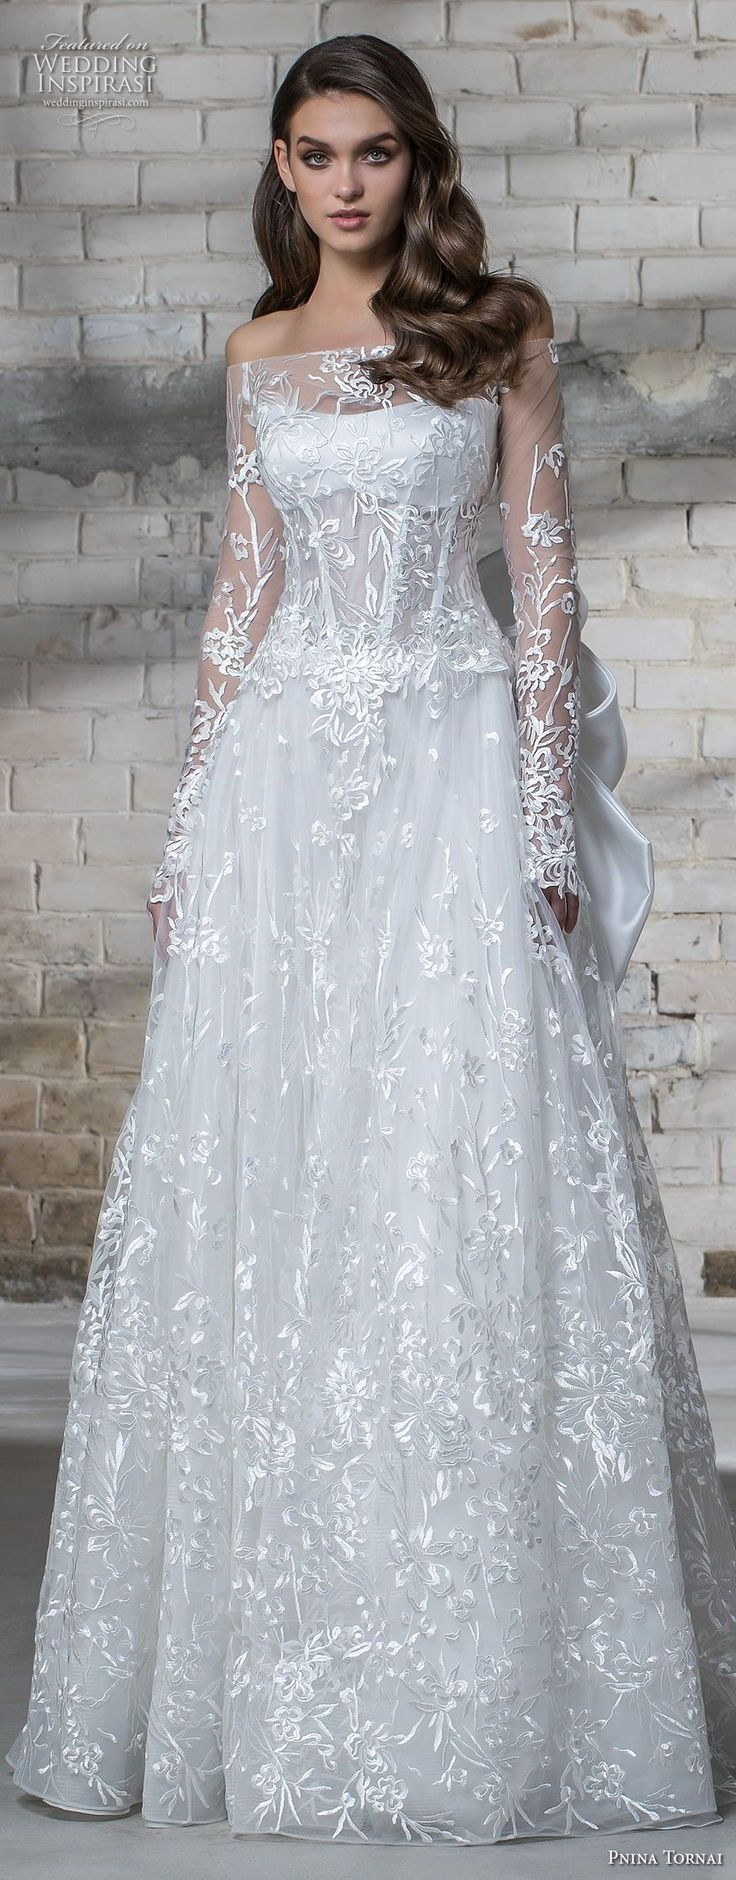 215 best pnina images on Pinterest | Wedding frocks, Homecoming ...